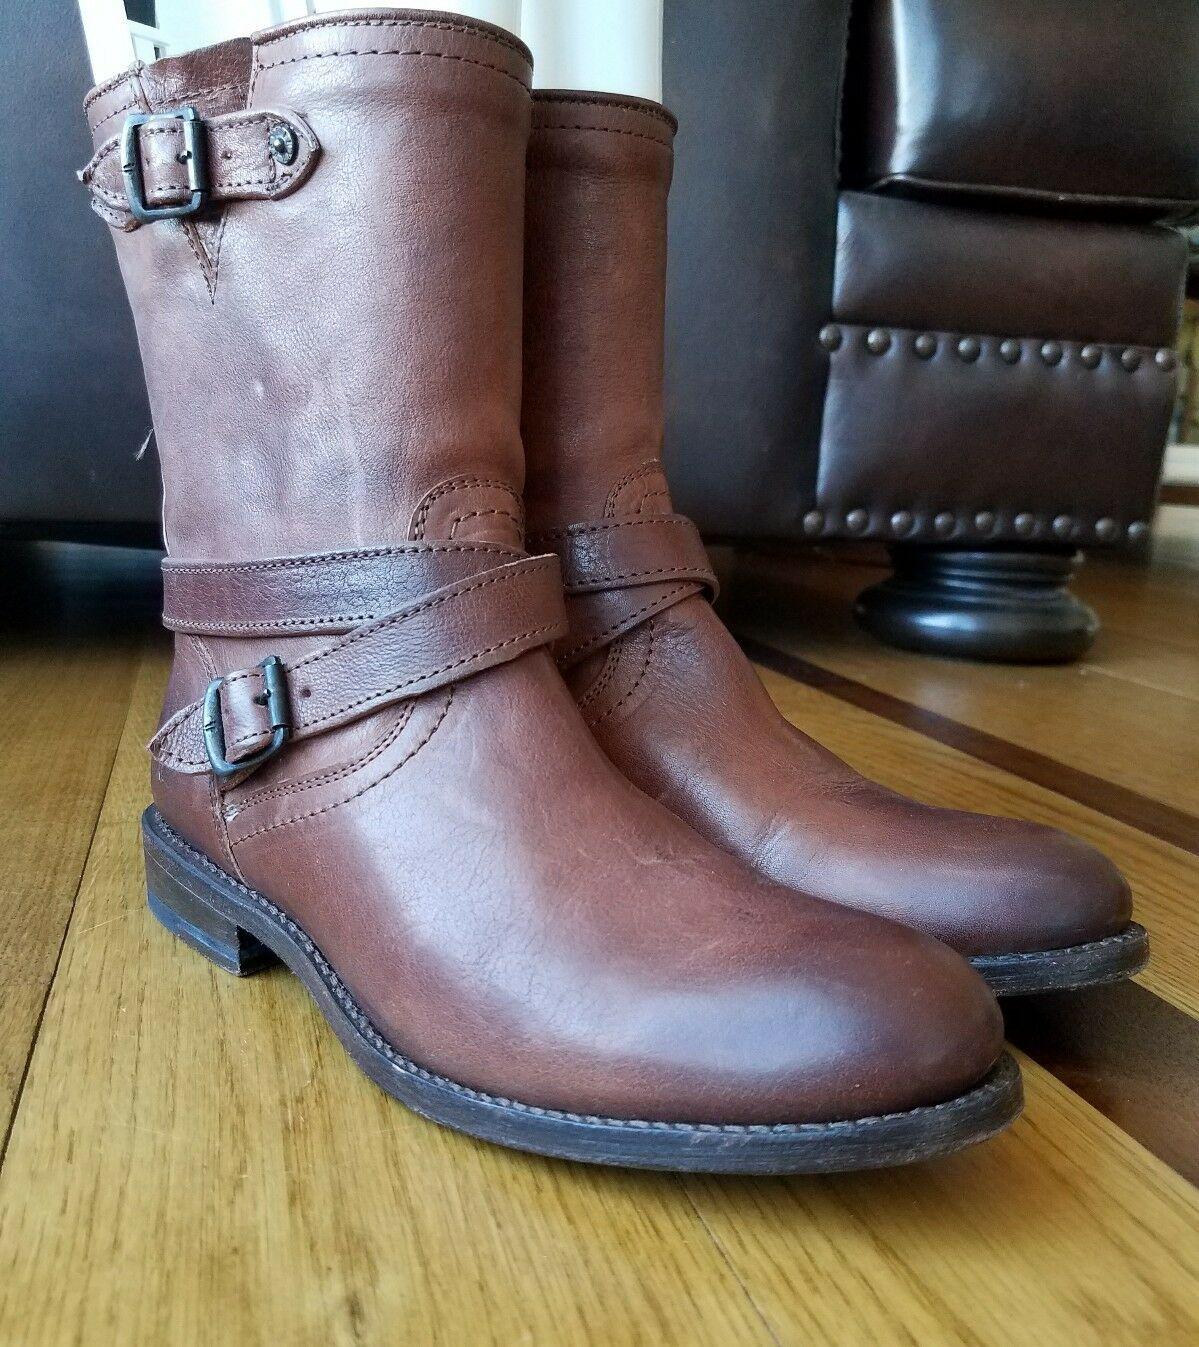 Frye JAYDEN Woman's Brown Boot Leather Cross Engineer Short Boot Brown Size 7.5 B 76316 67bdef